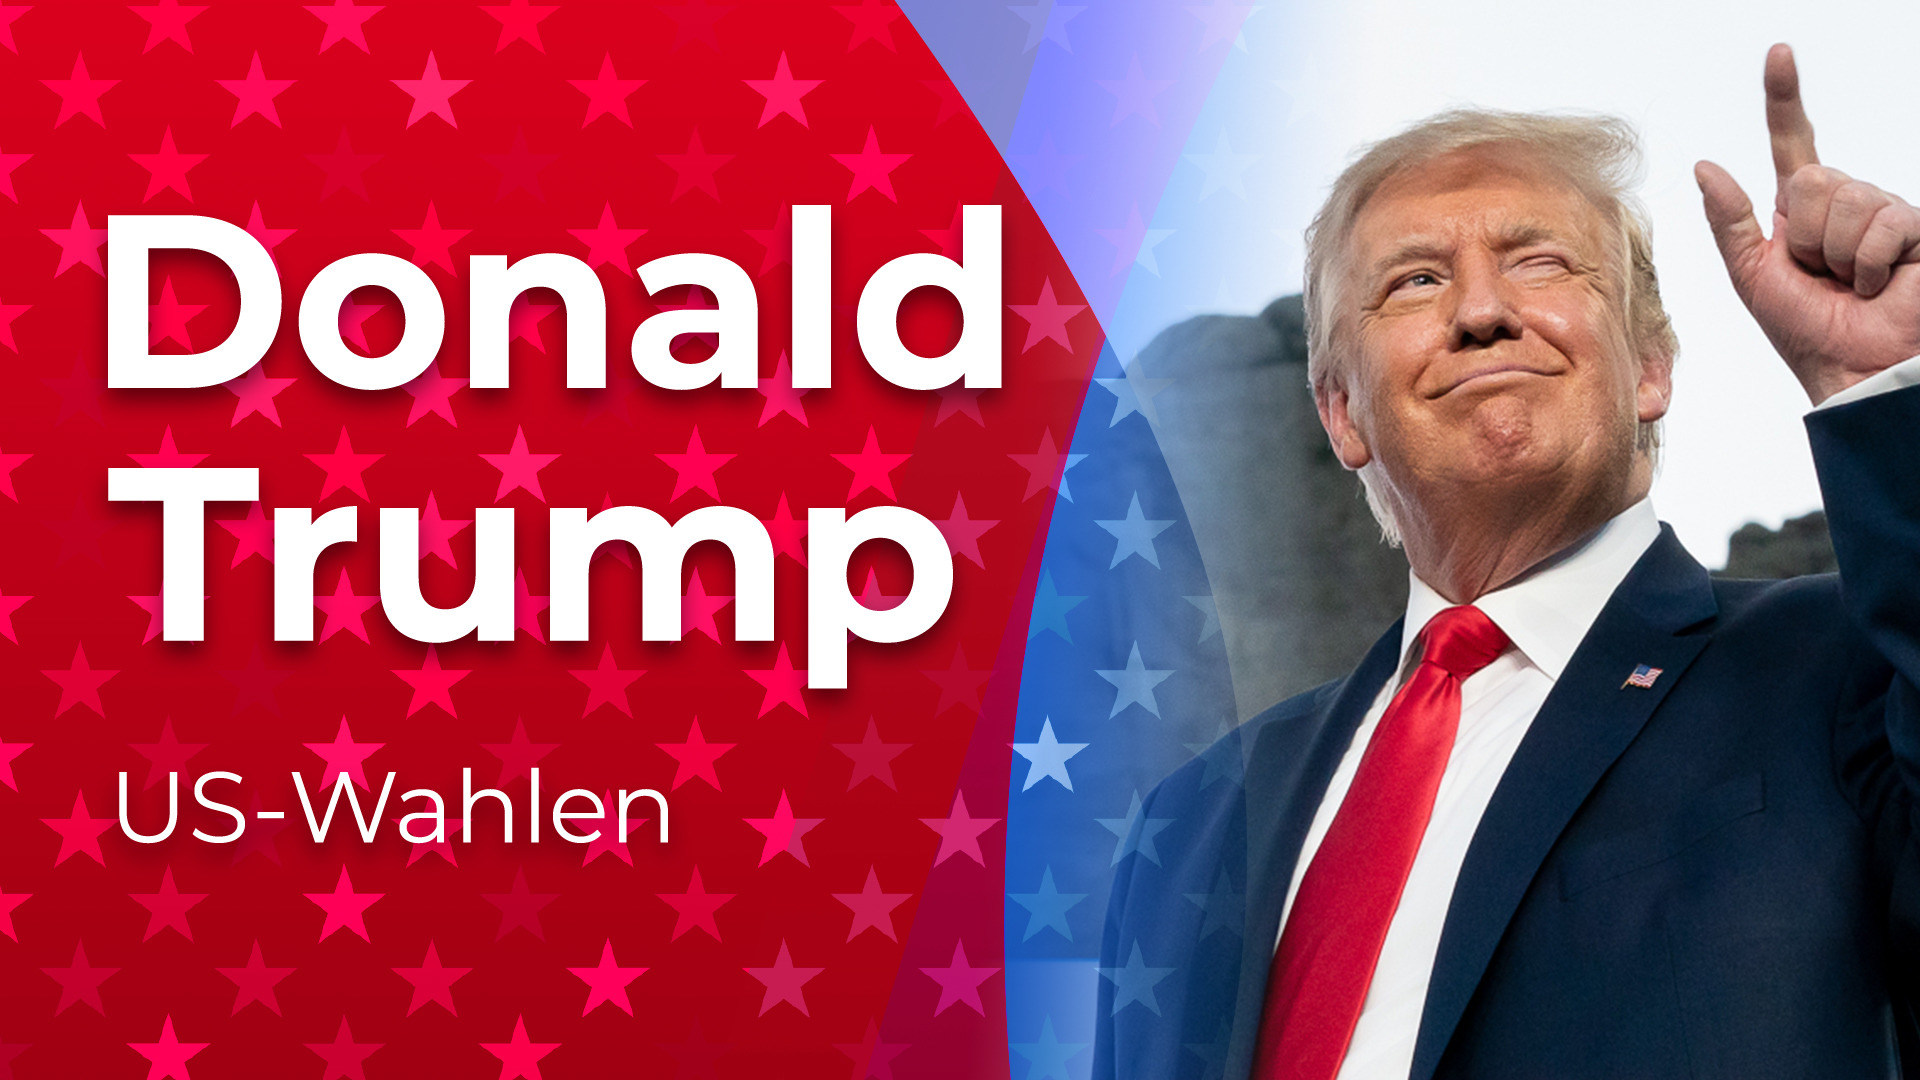 trump, Donald Trump, US-Präsident, Präsident, Weißes Haus, US-Wahl, US-Wahlen, US-Wahlen 2020, USA 2020